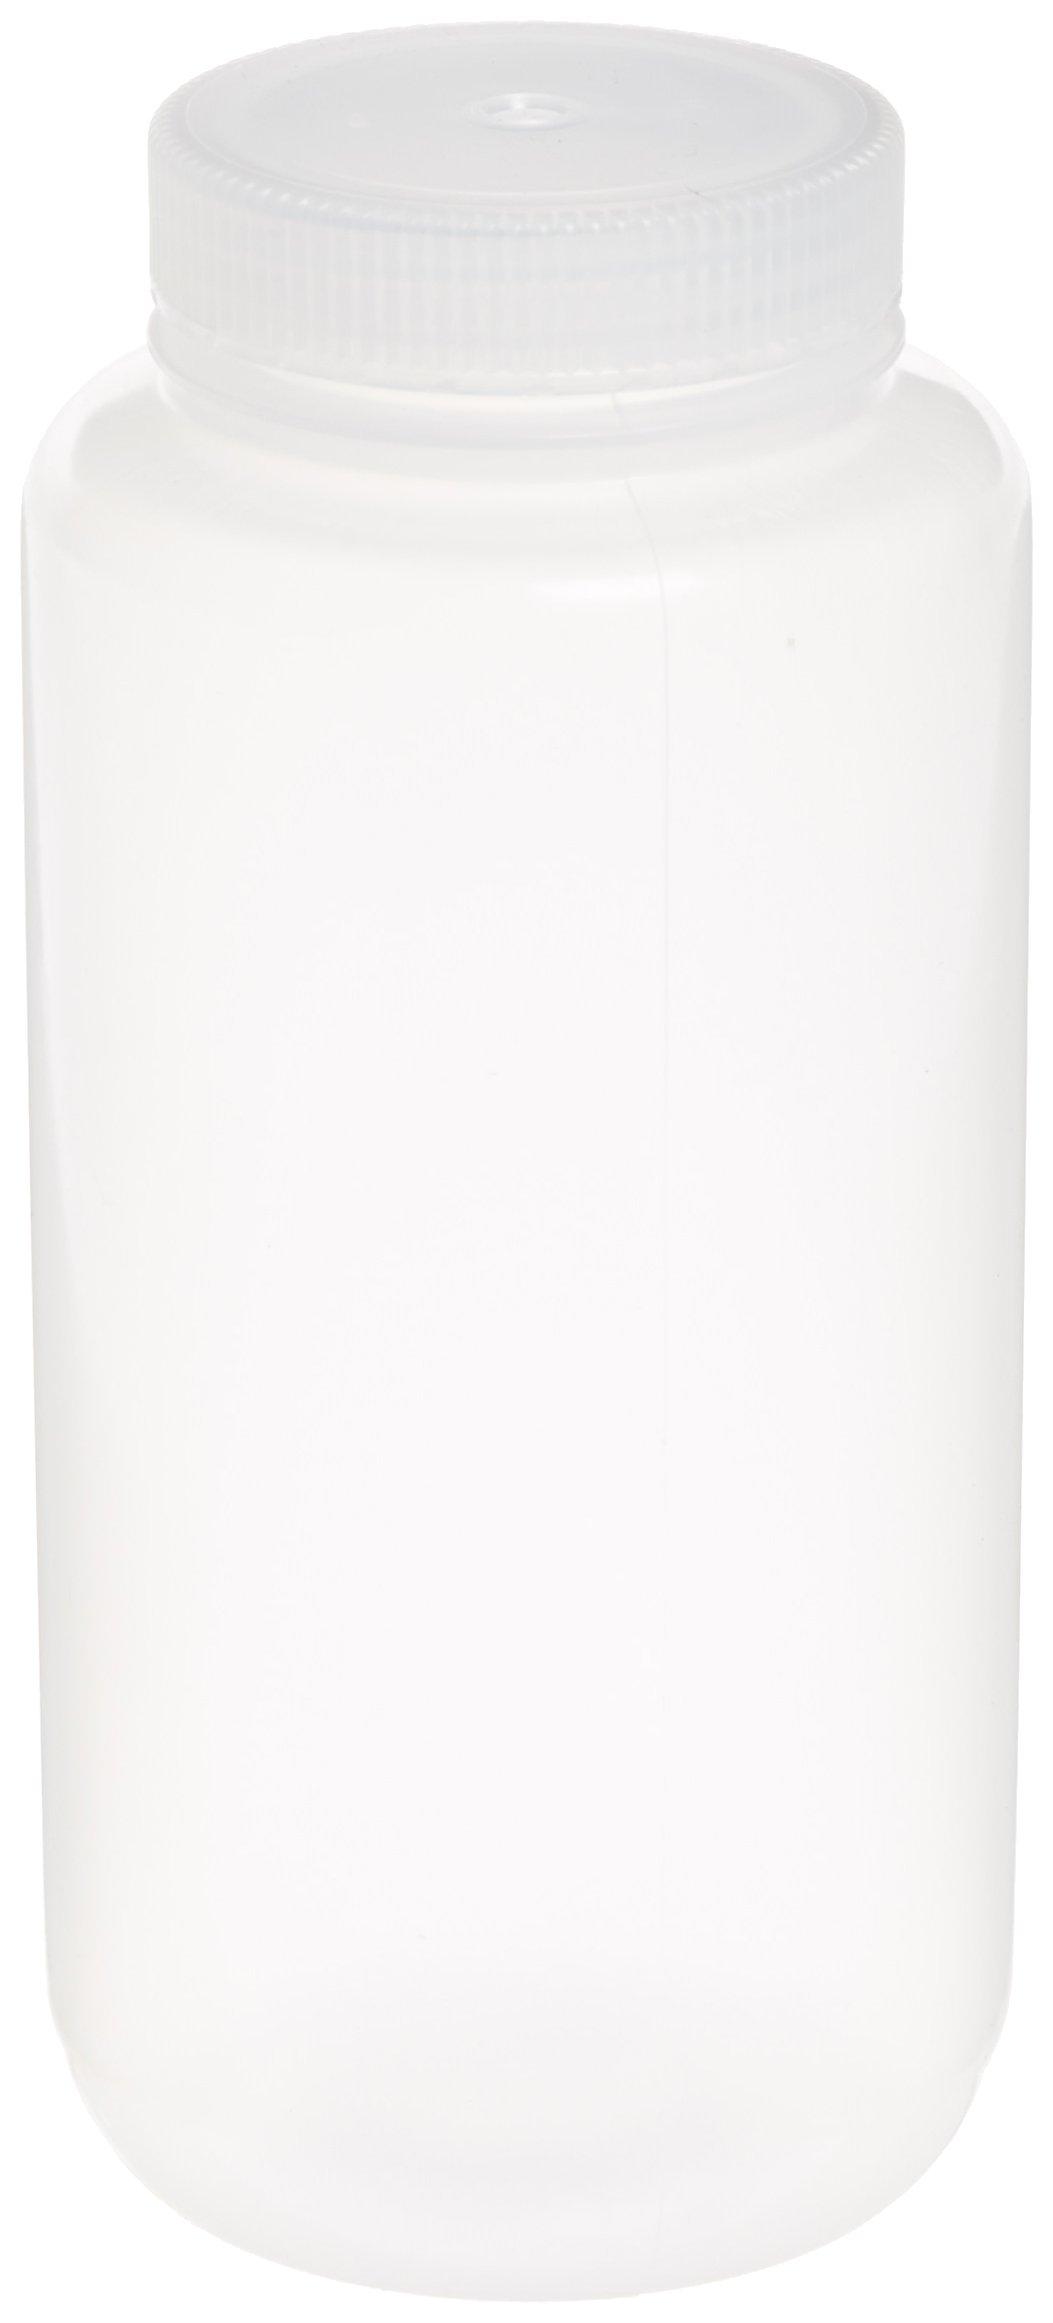 Nalgene Polypropylene Wide Mouth Packaging Bottle, 32 oz/1000ml(Case of 50)